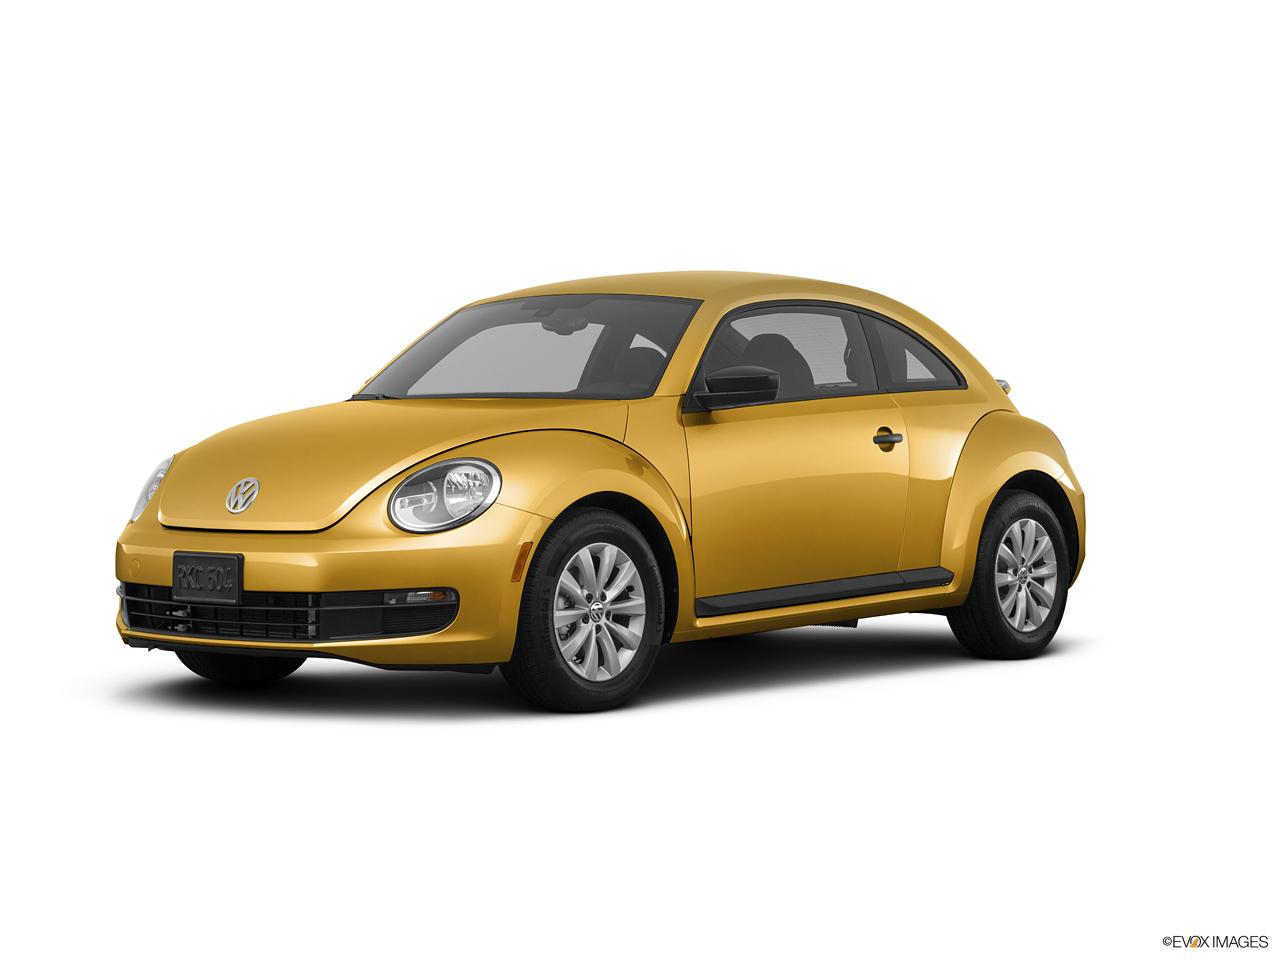 Car Pictures List For Volkswagen Beetle 2016 S Uae